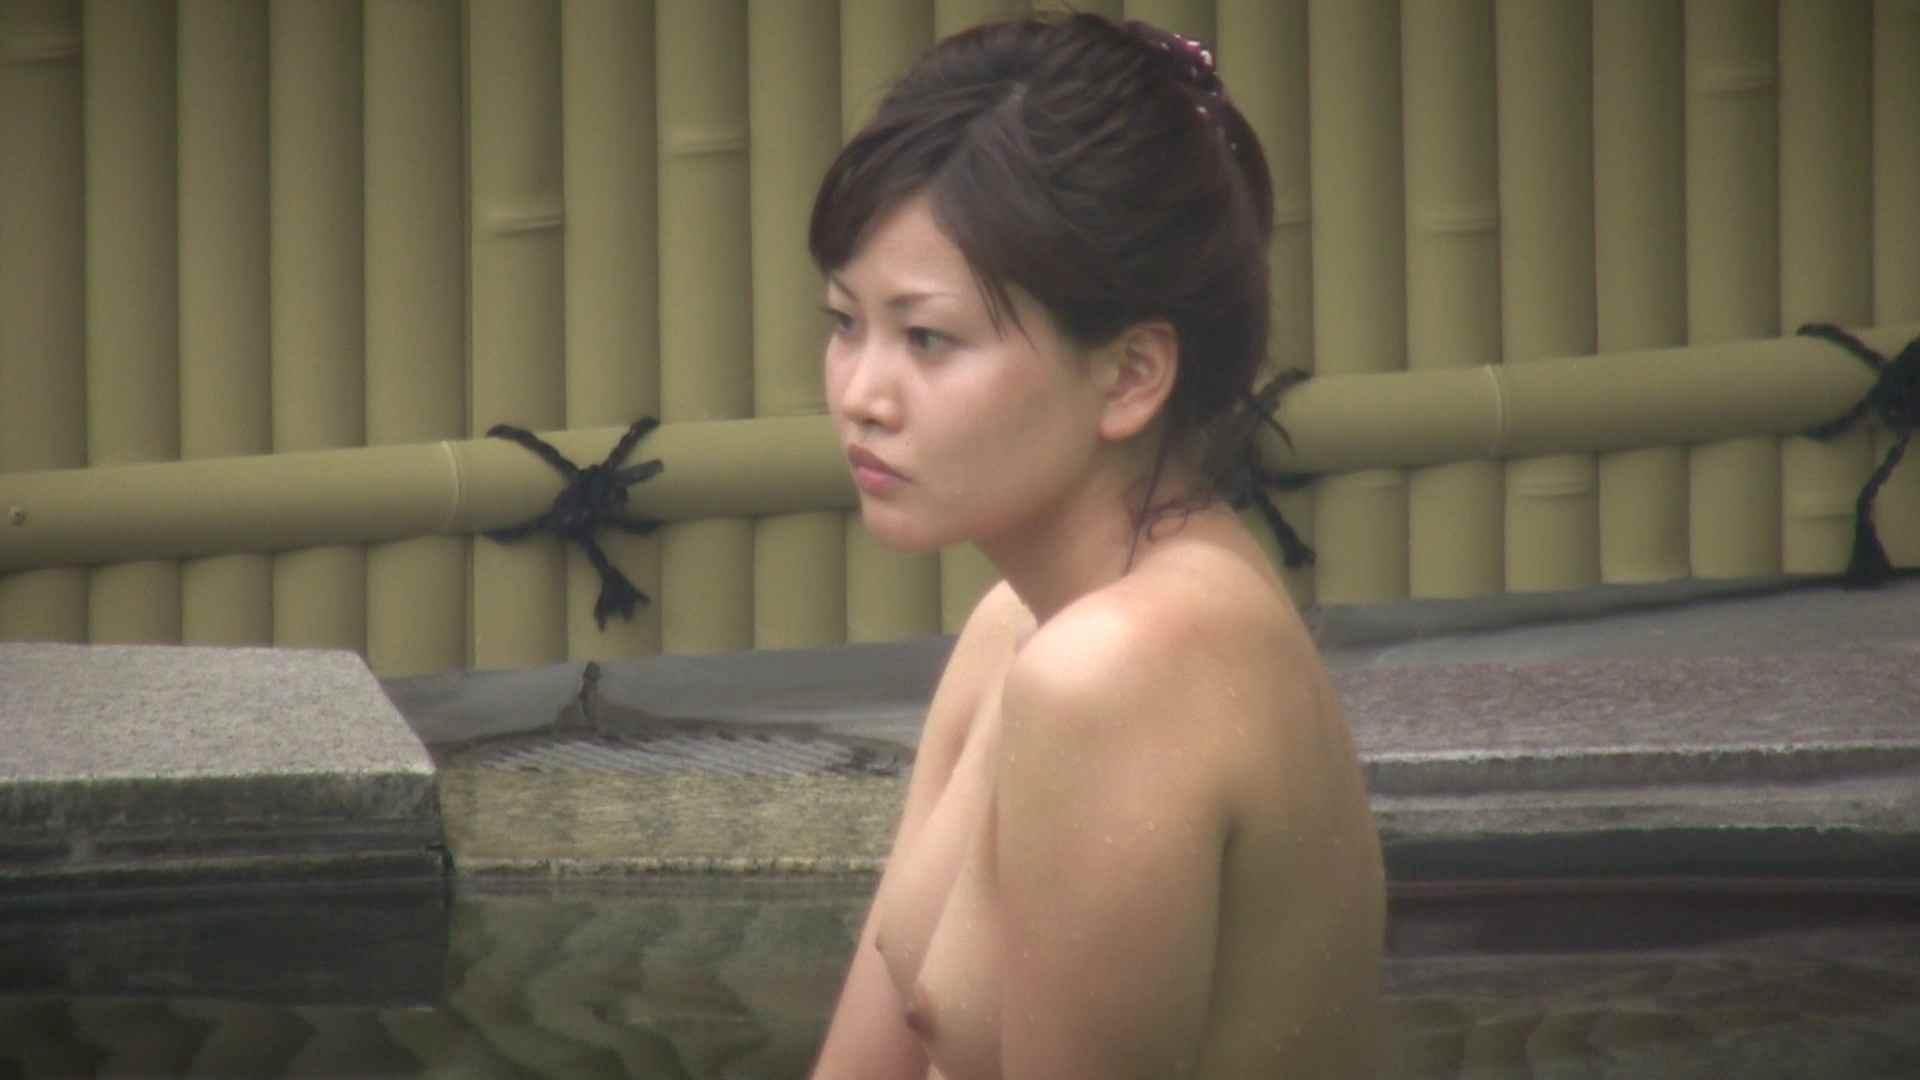 Aquaな露天風呂Vol.125 OLのプライベート  10pic 9